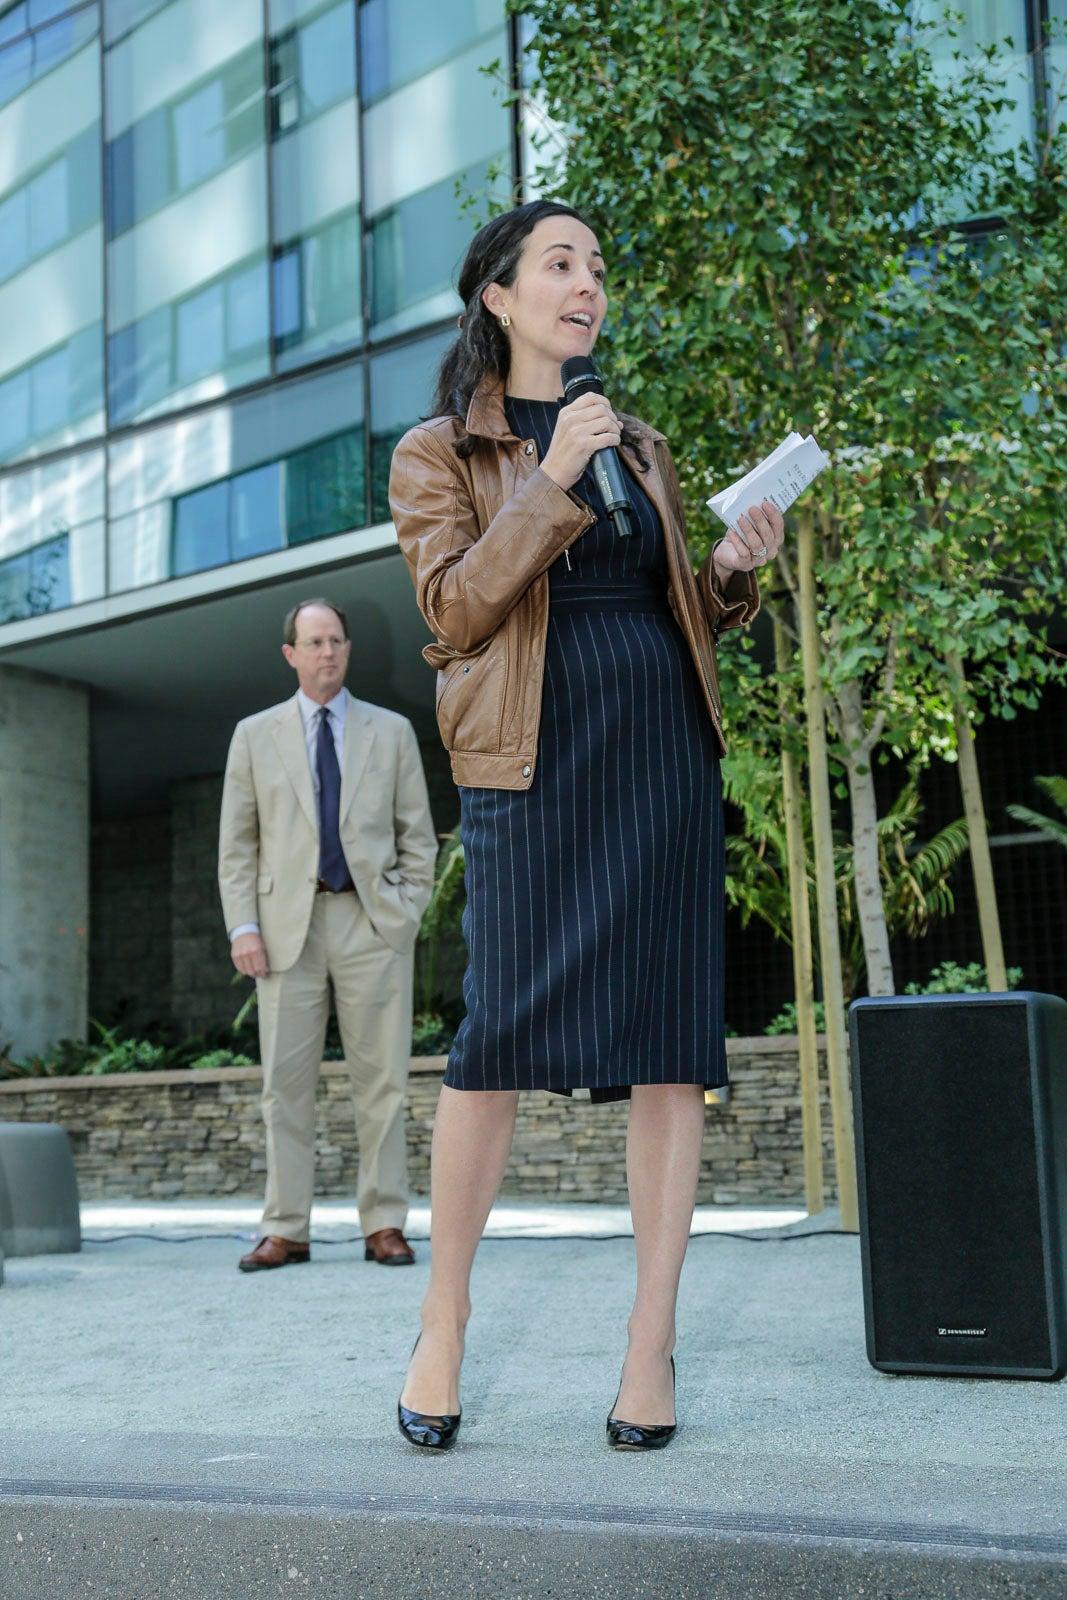 Natalie Martirosian, Director, Tishman Speyer